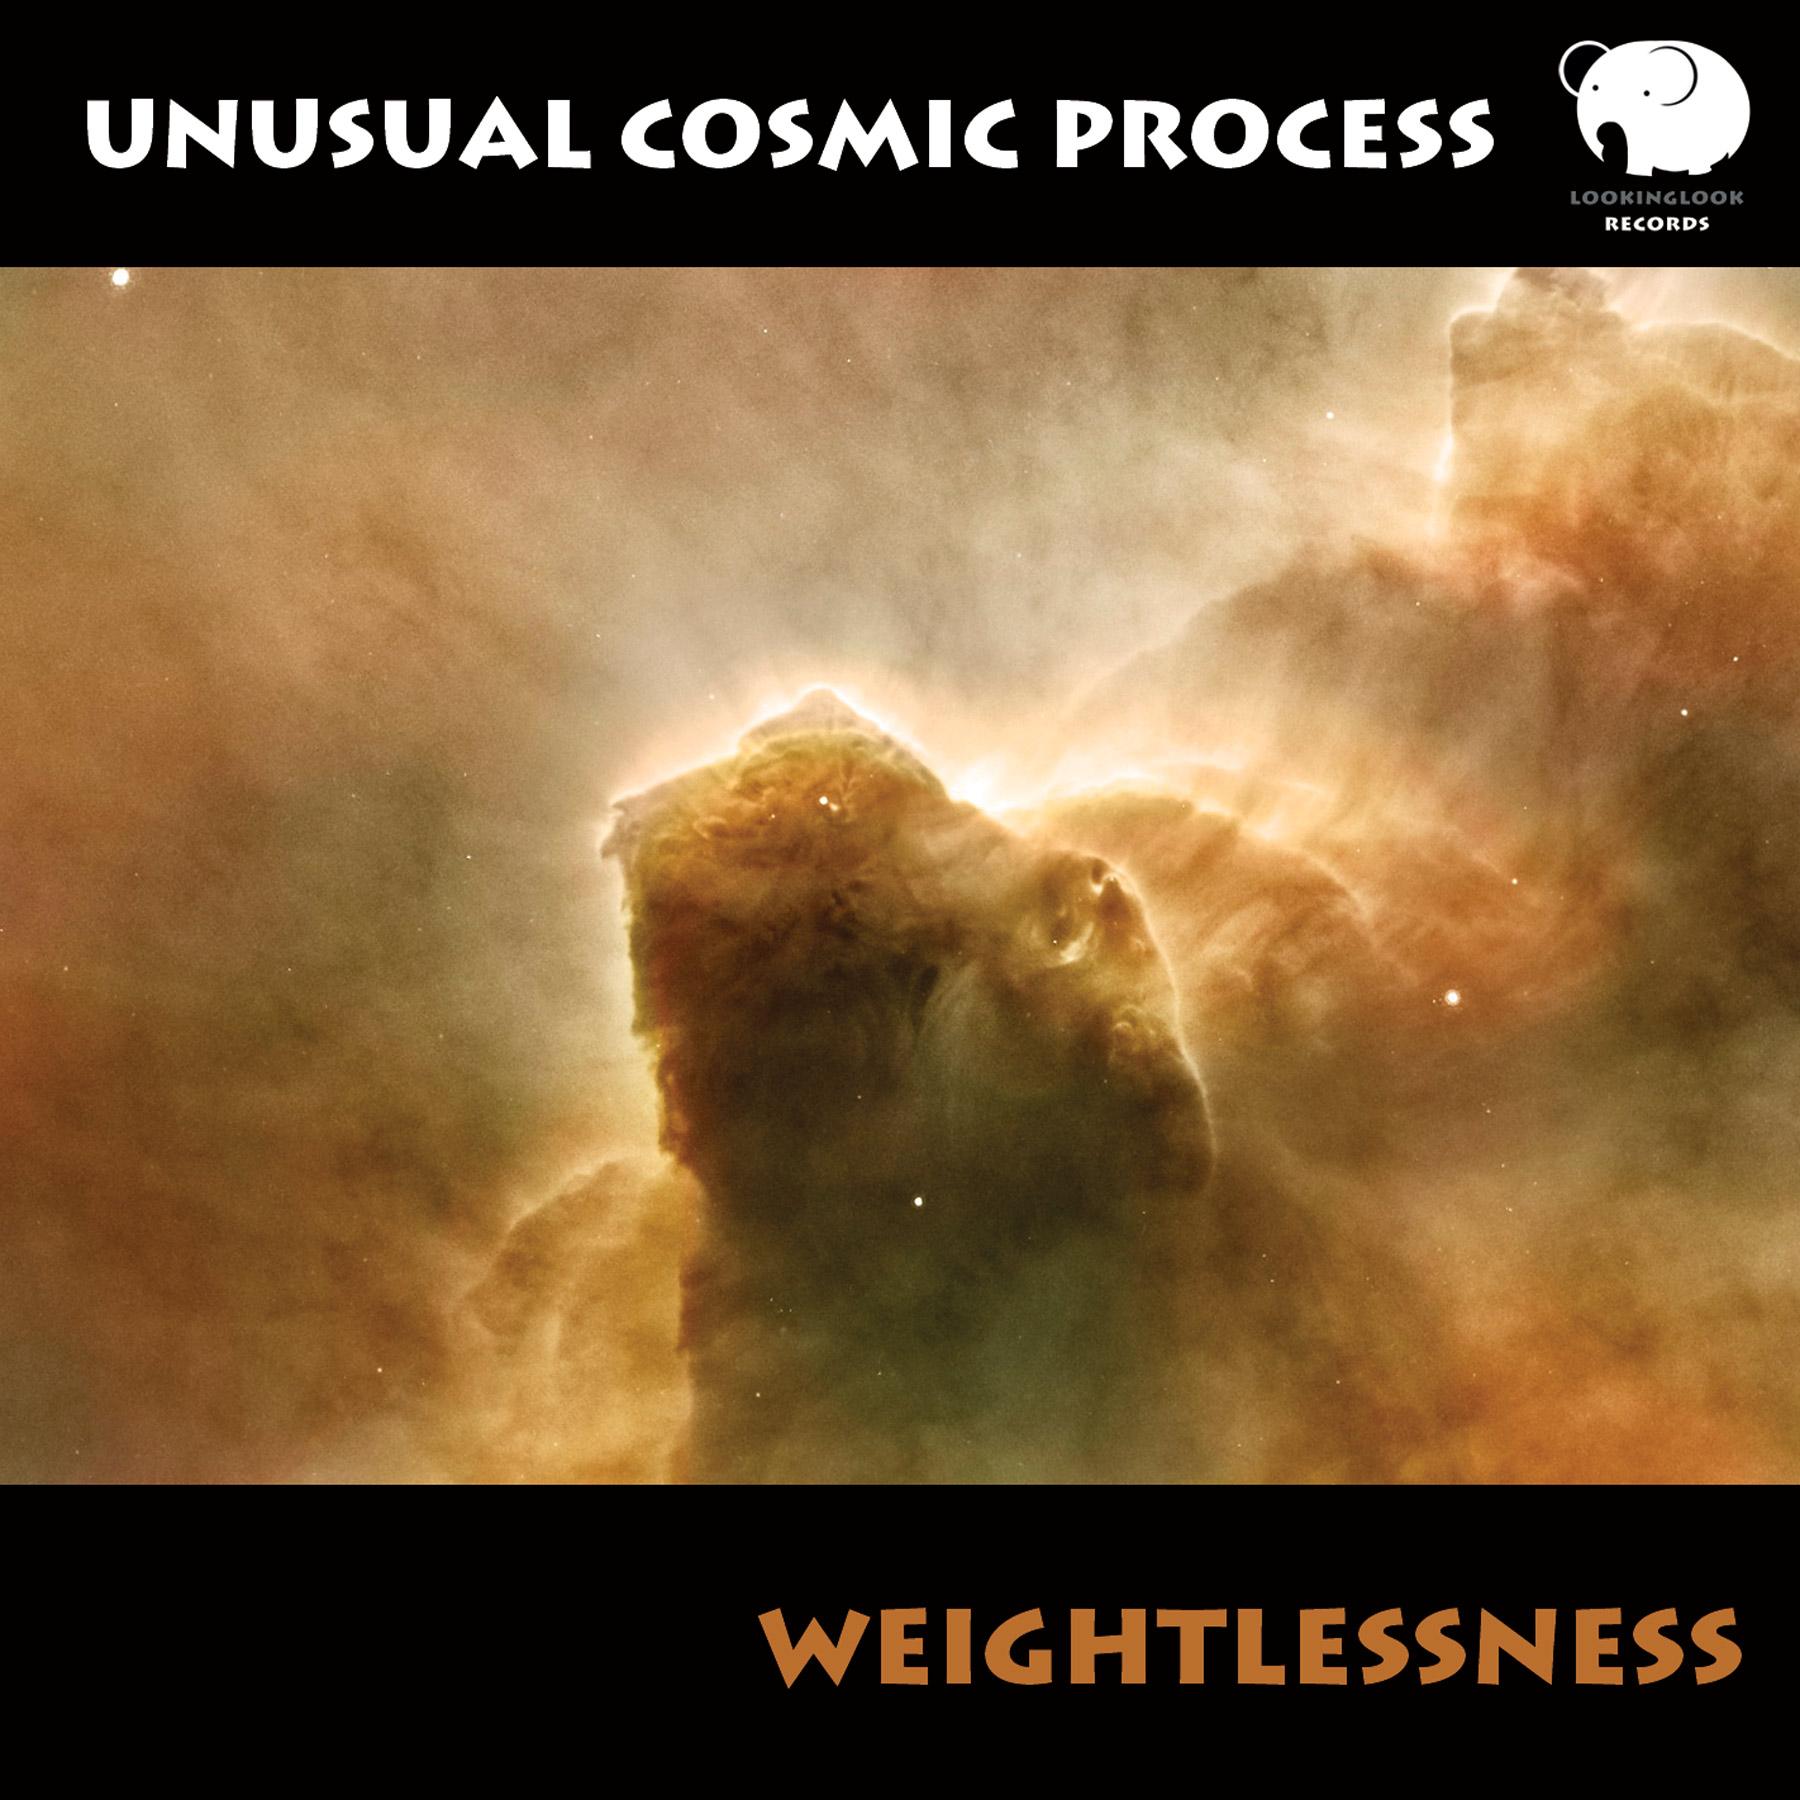 Unusual Cosmic Process «Weightlessness»